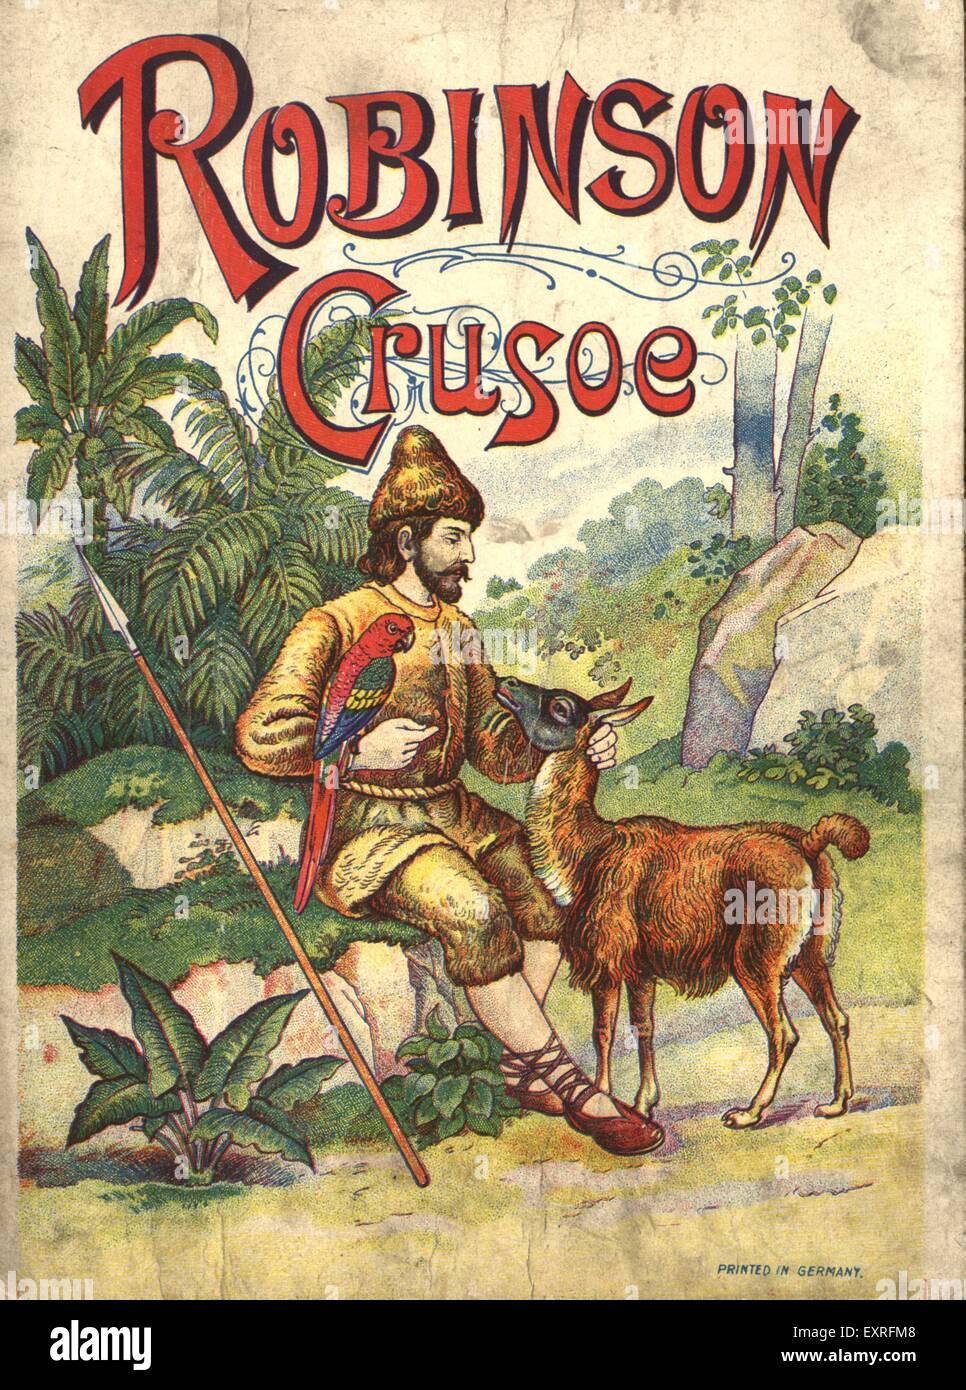 robinson crusoe movie